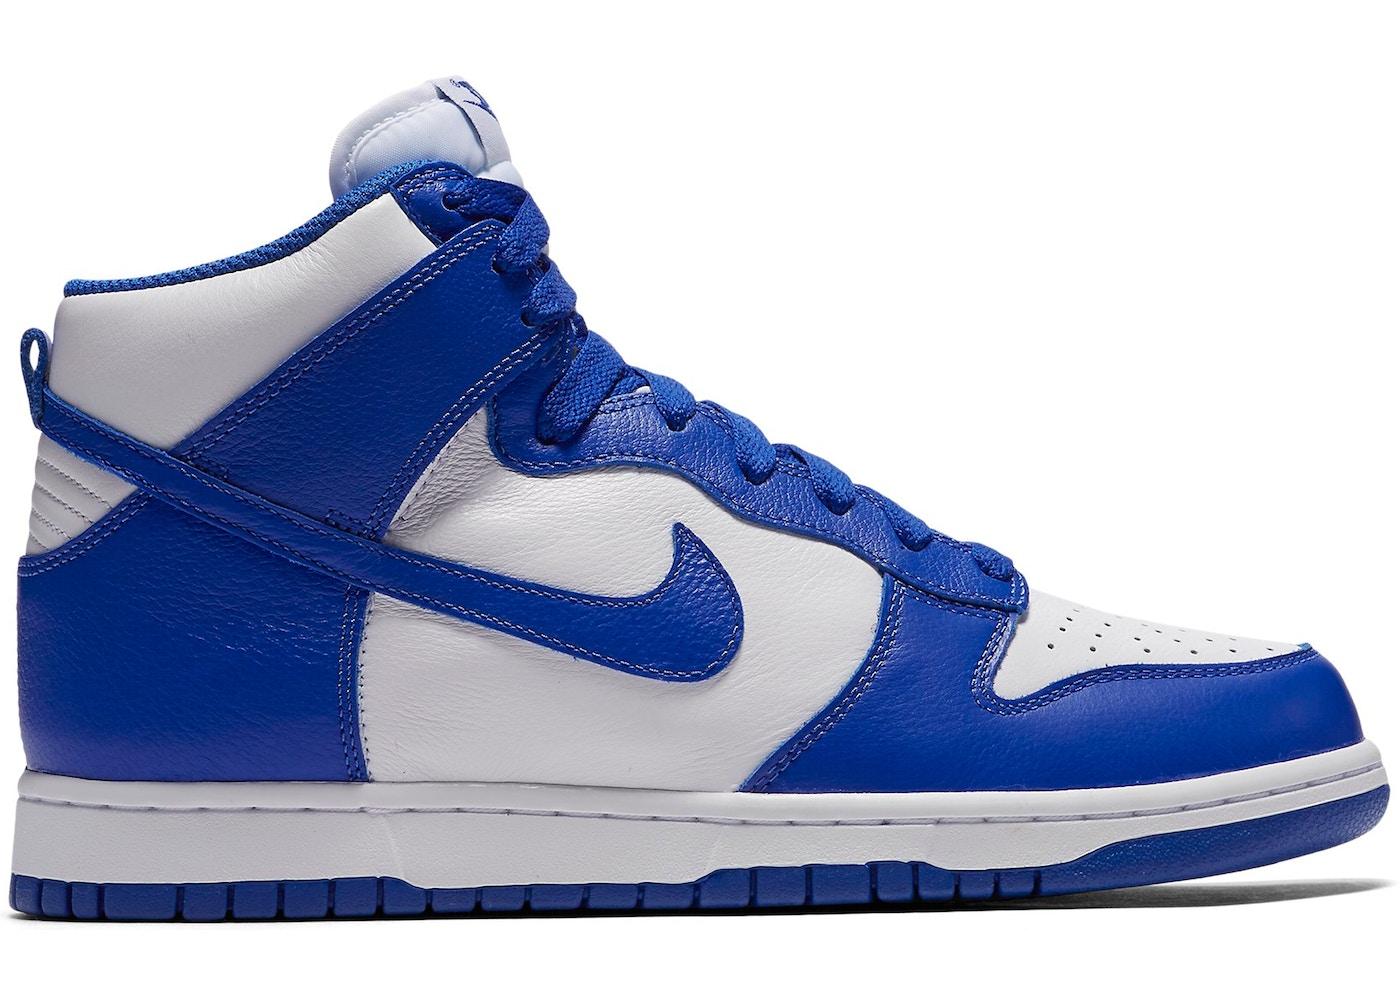 9f847a88fa06 Nike Dunk High Kentucky (2016) - 850477-100